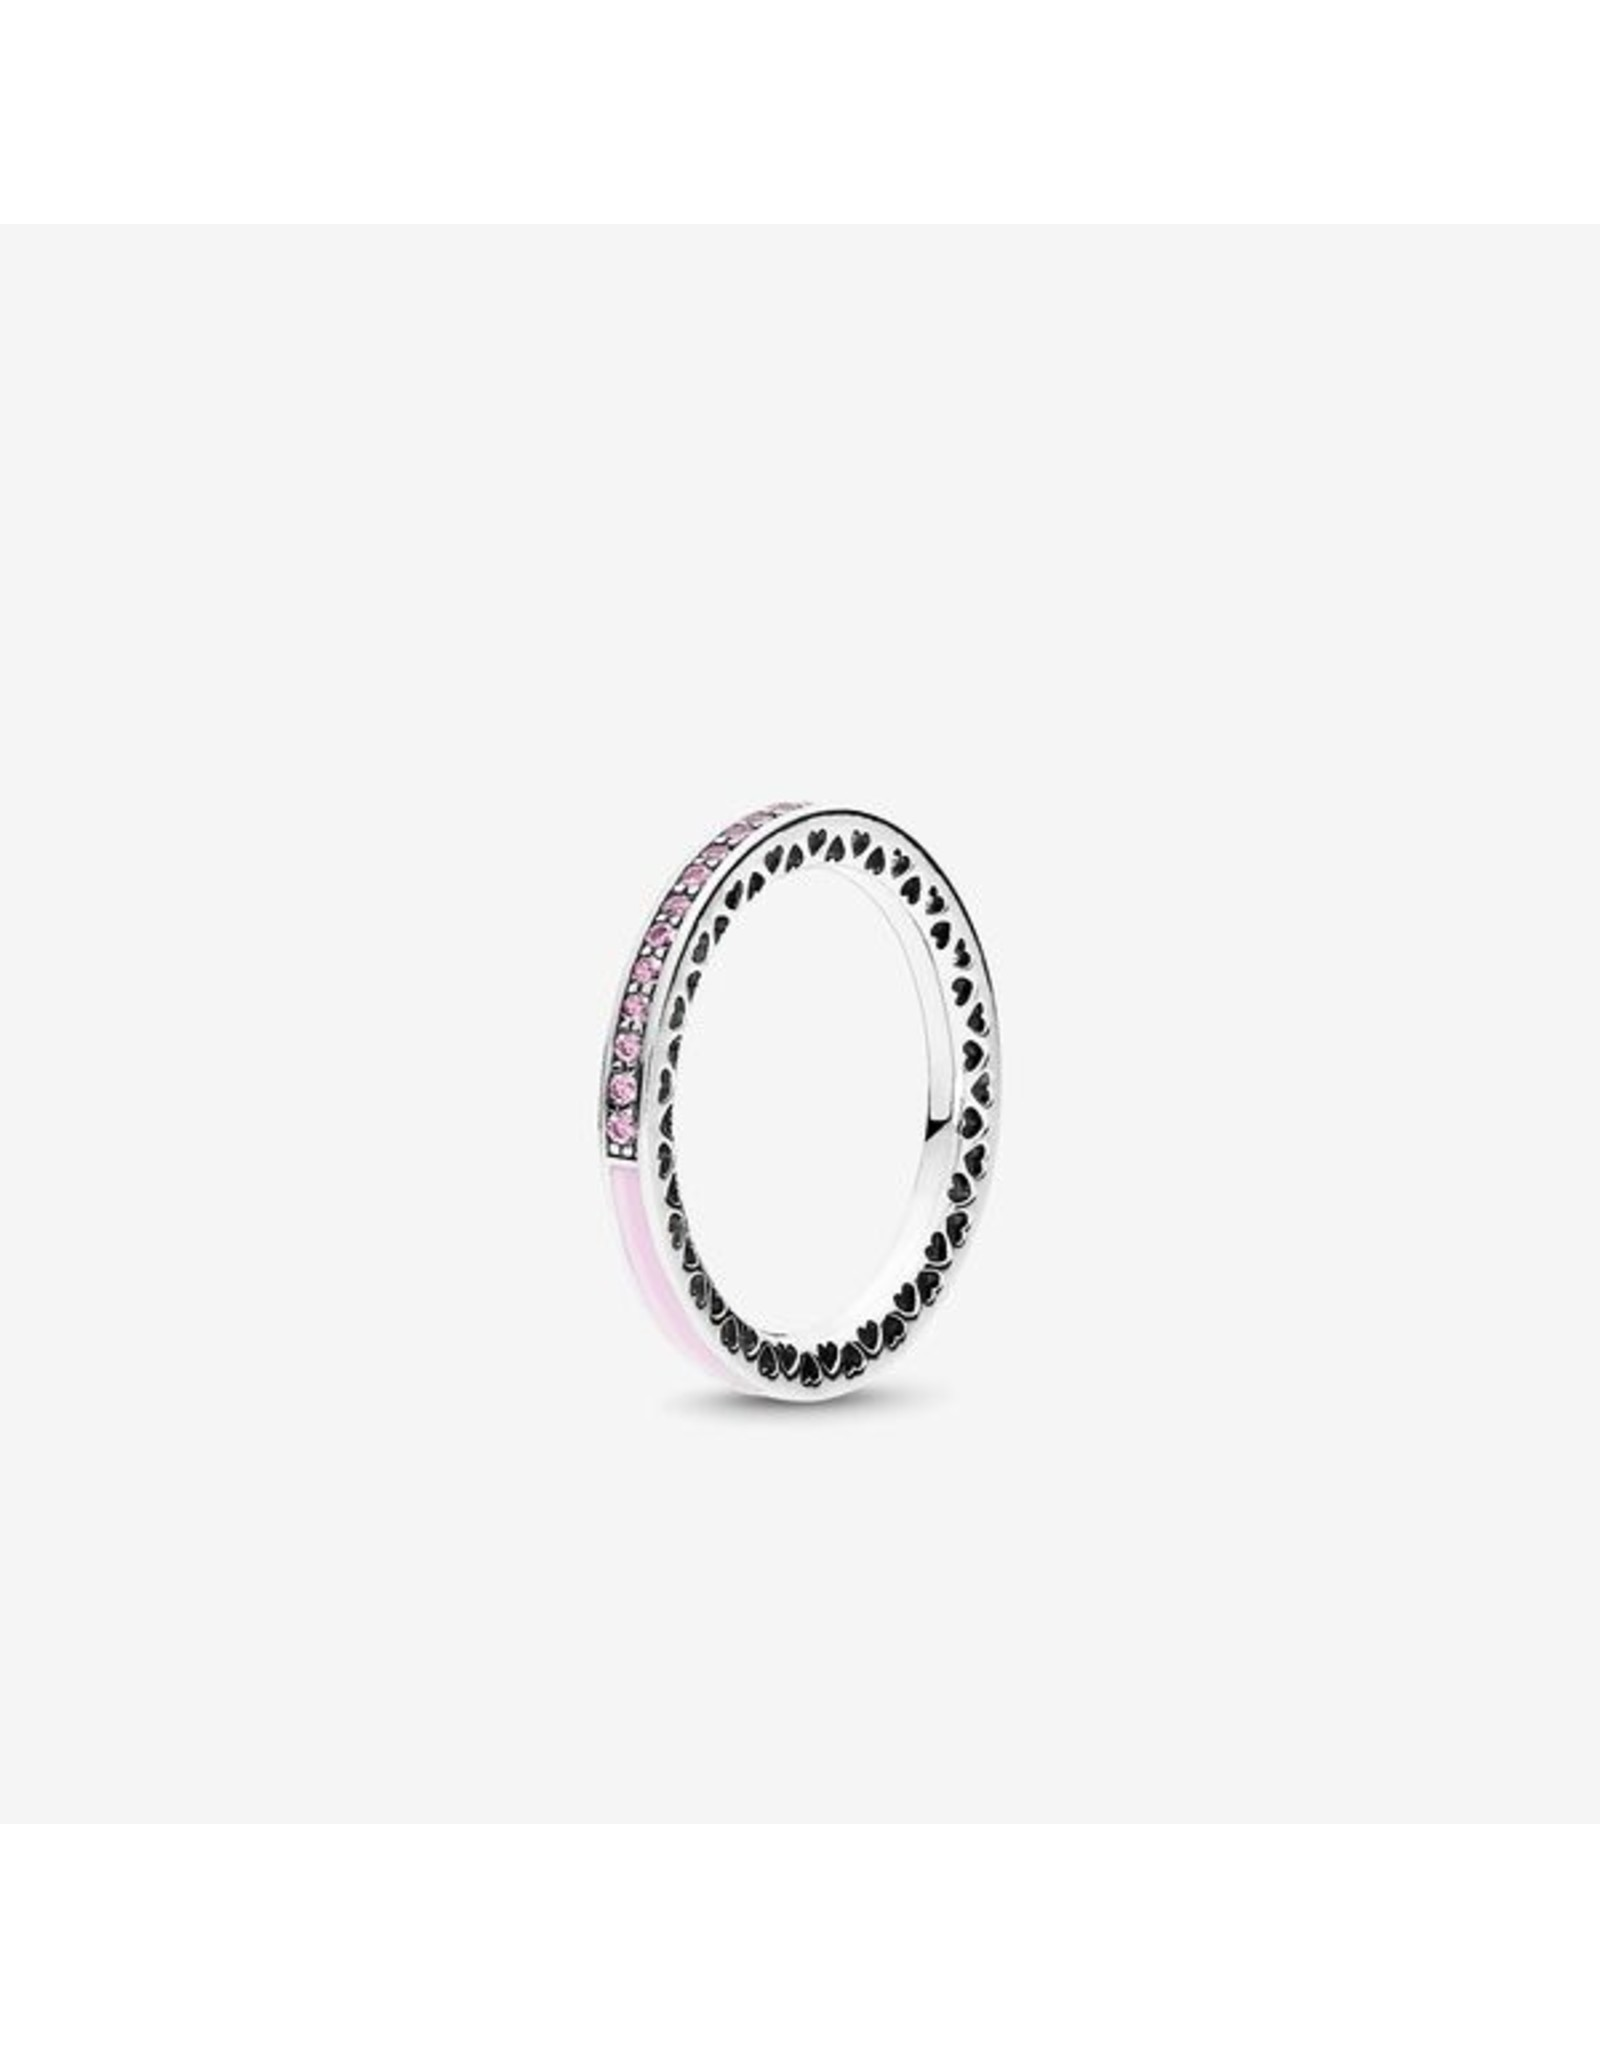 Pandora Pandora Ring, Radiant Heart Of Pandora, Light Pink